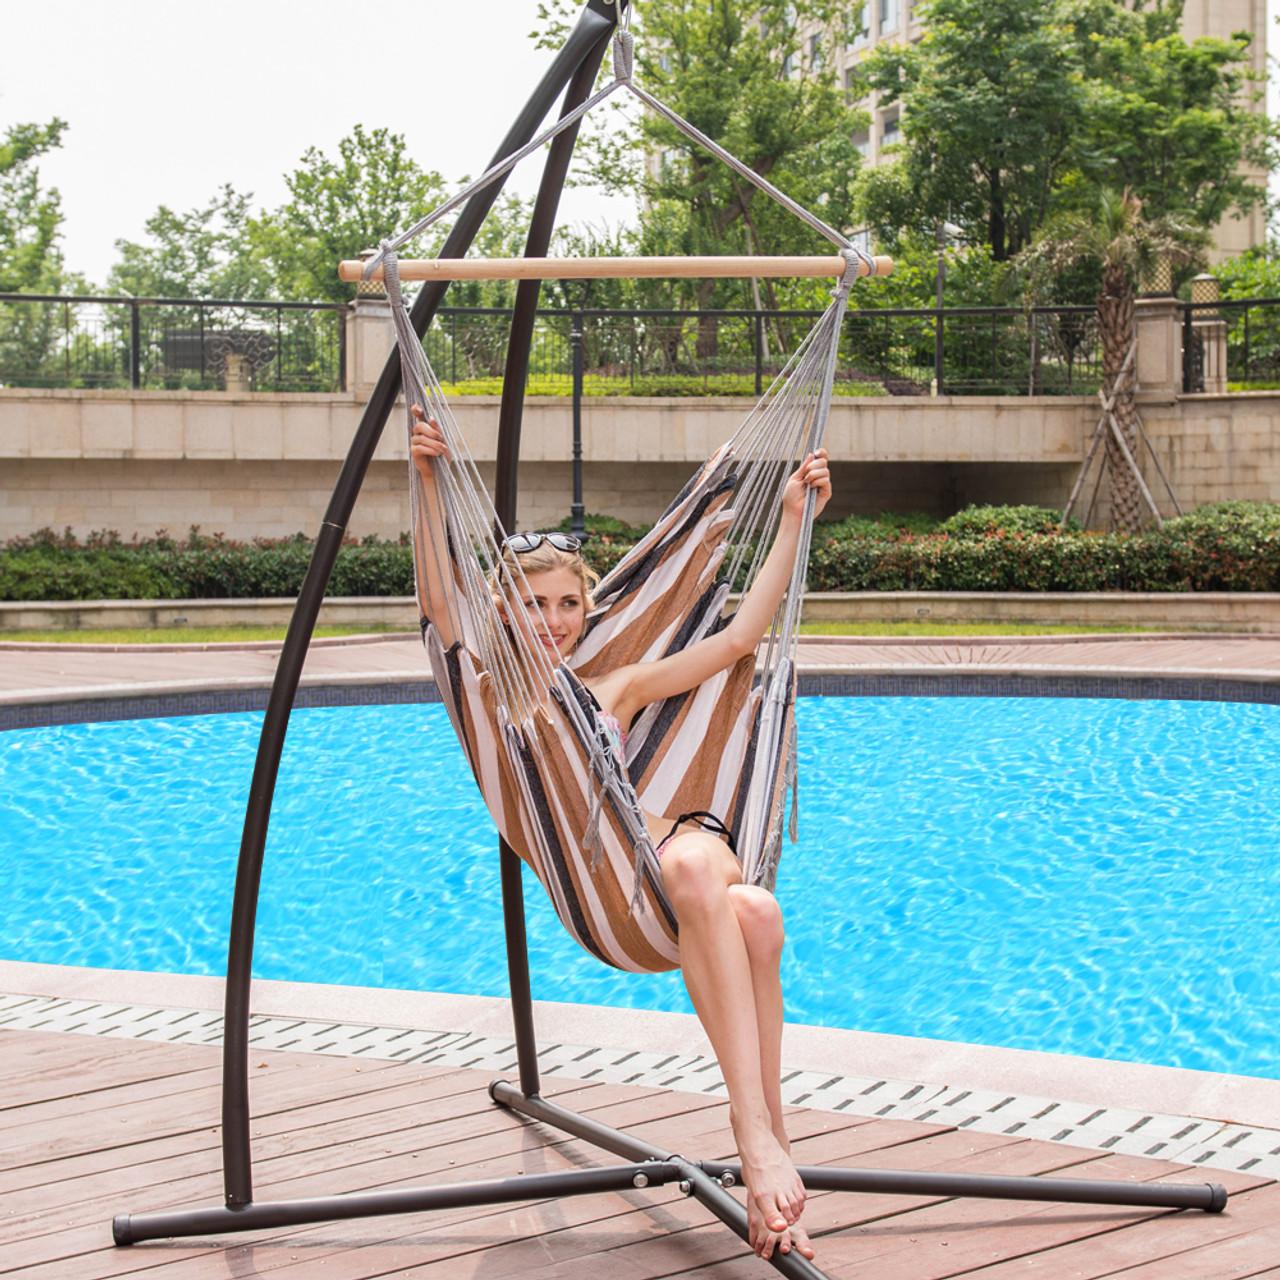 Lazy Daze Hammocks Canvas Hanging Hammock Swing Chair Seat With Wood  Spreader Bar (Desert Stripe)